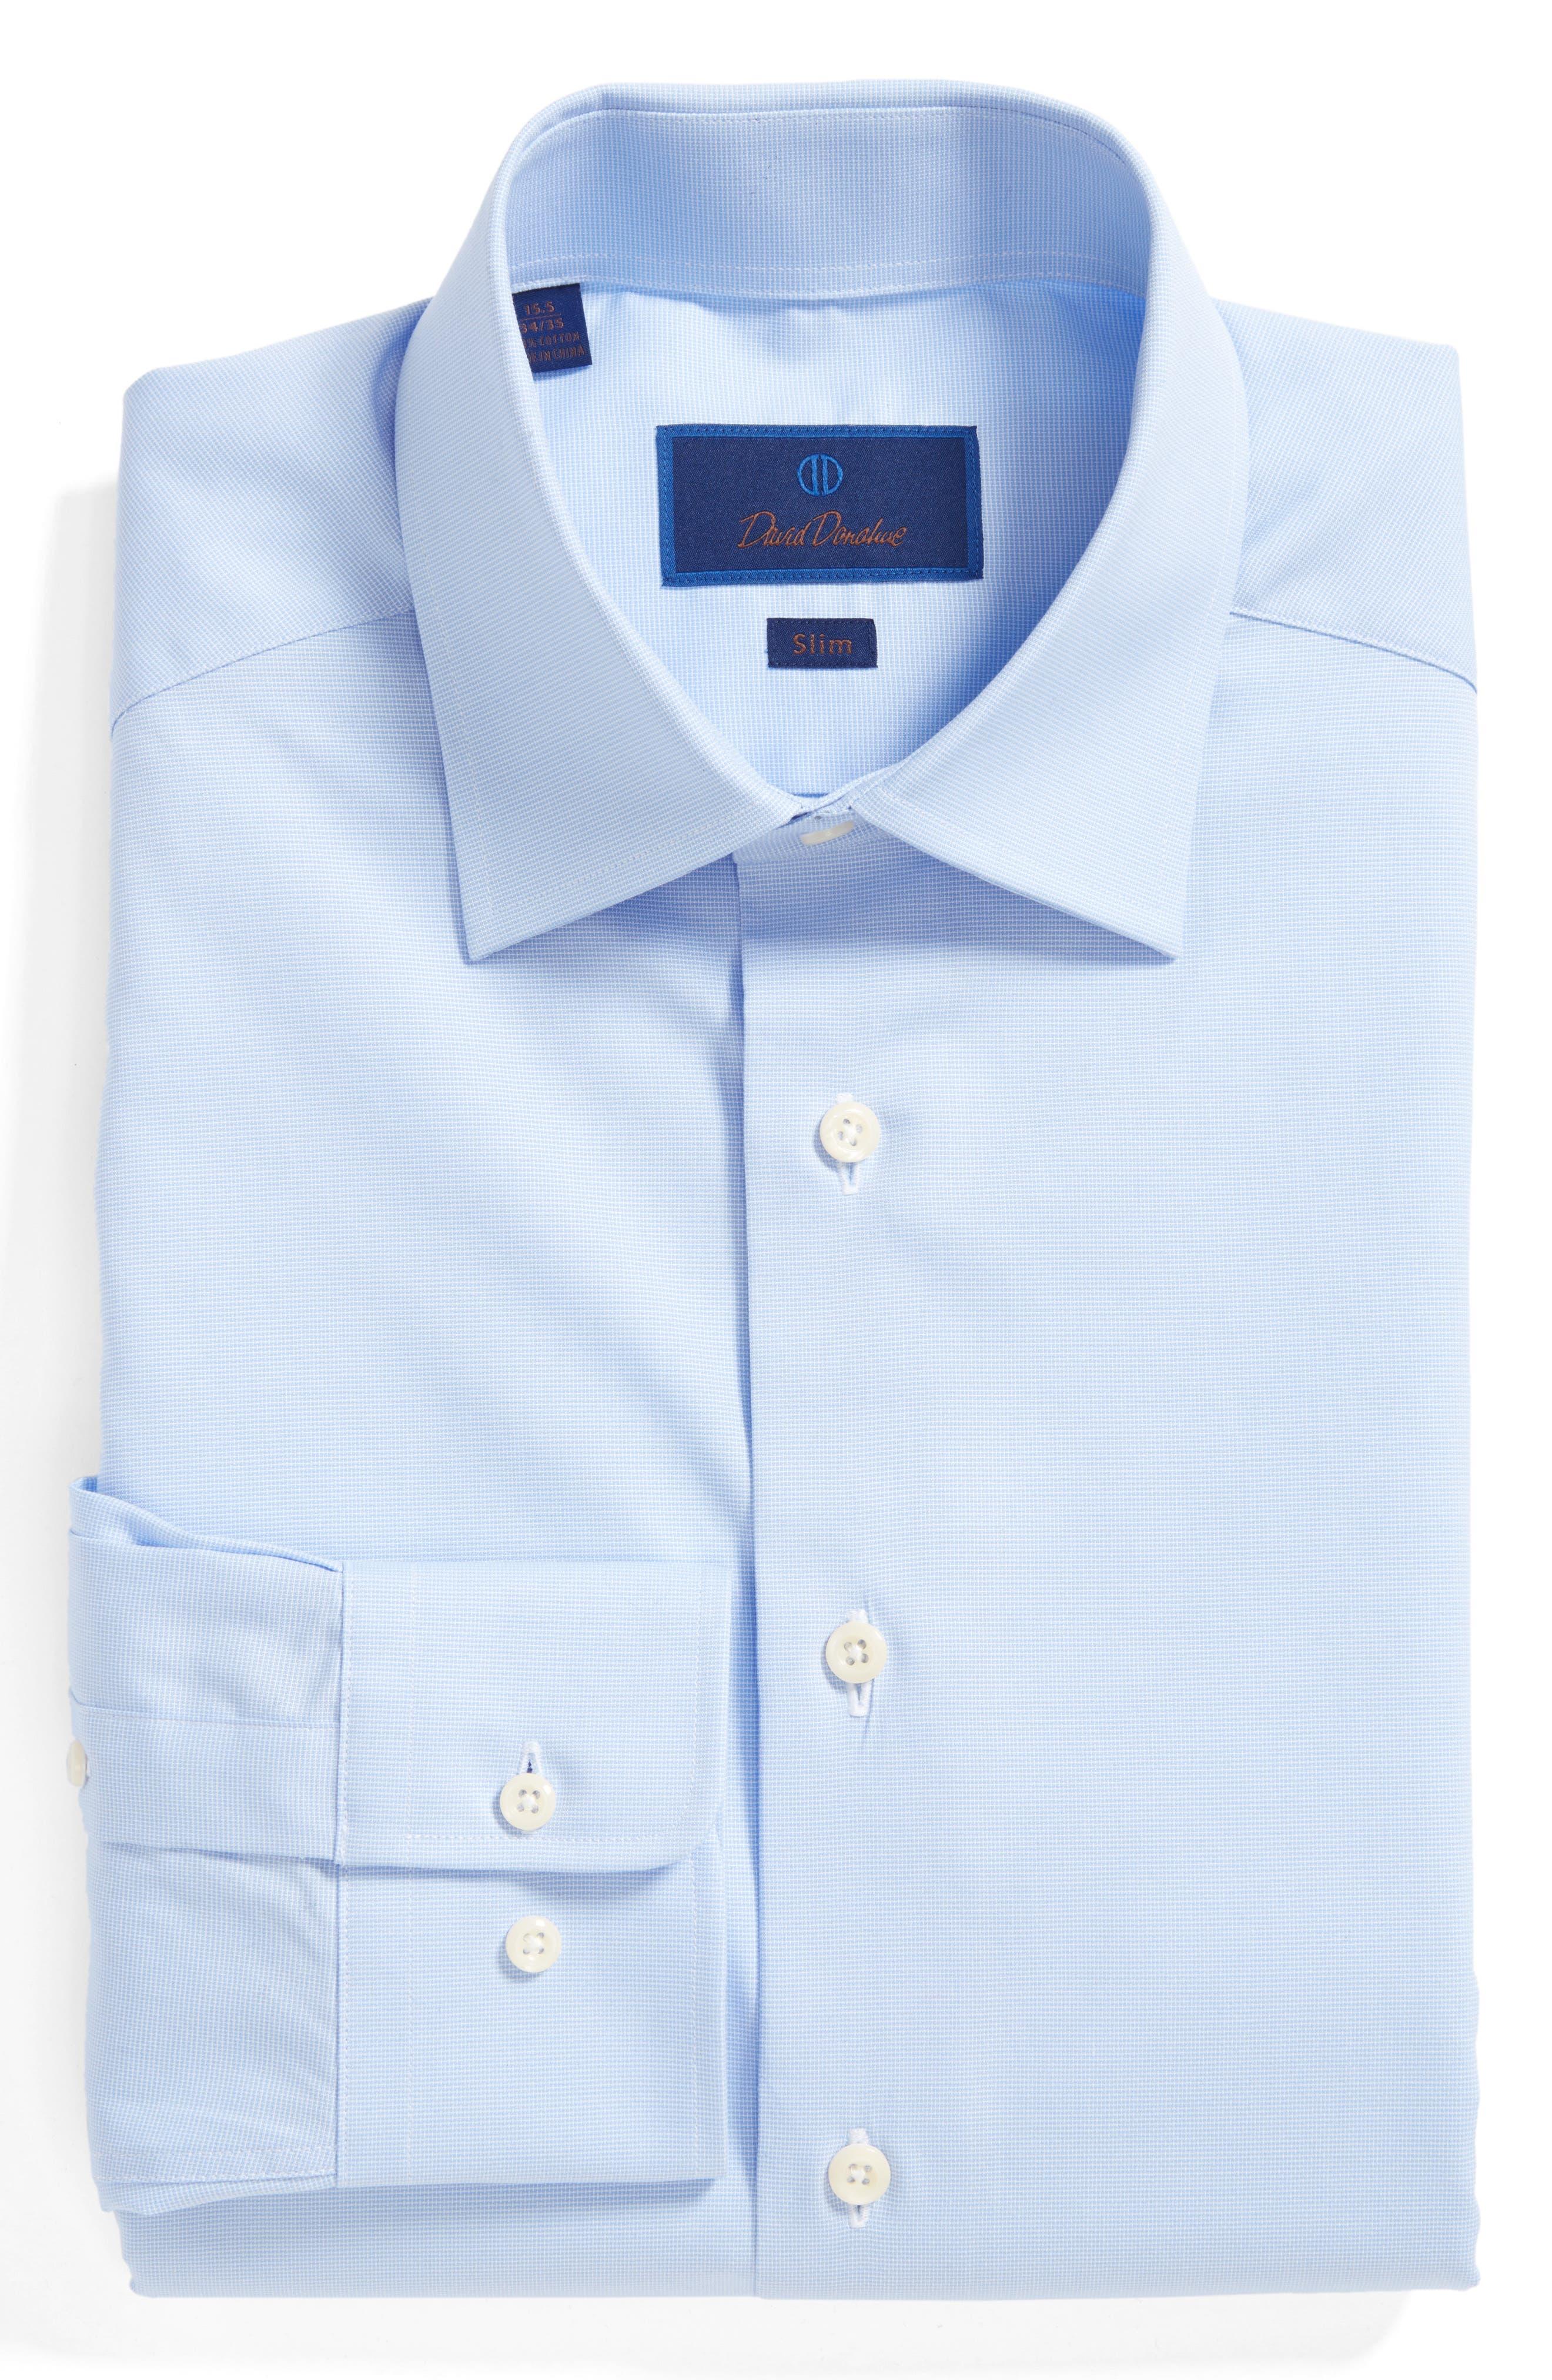 DAVID DONAHUE,                             Slim Fit Solid Dress Shirt,                             Alternate thumbnail 3, color,                             SKY